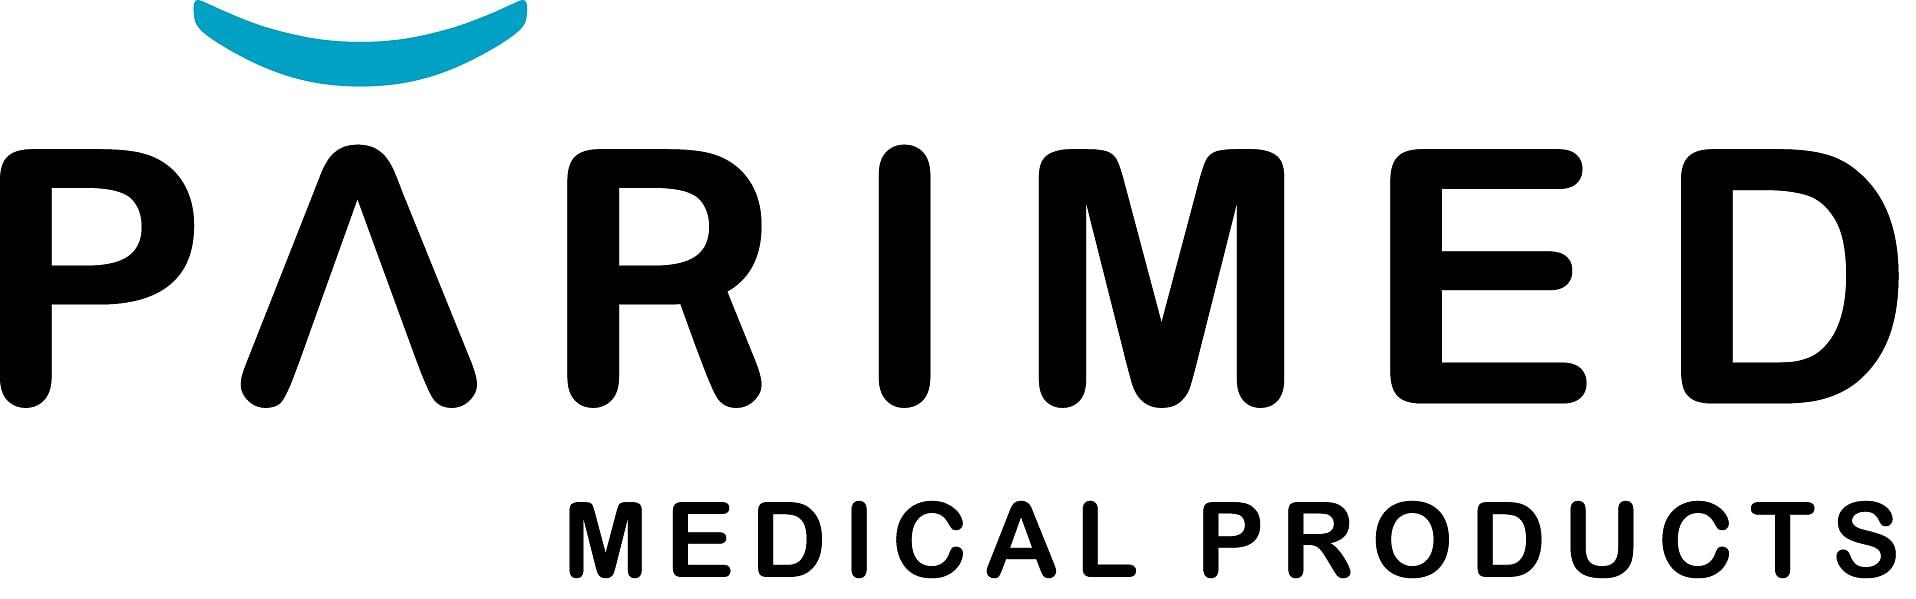 Parimed GmbH